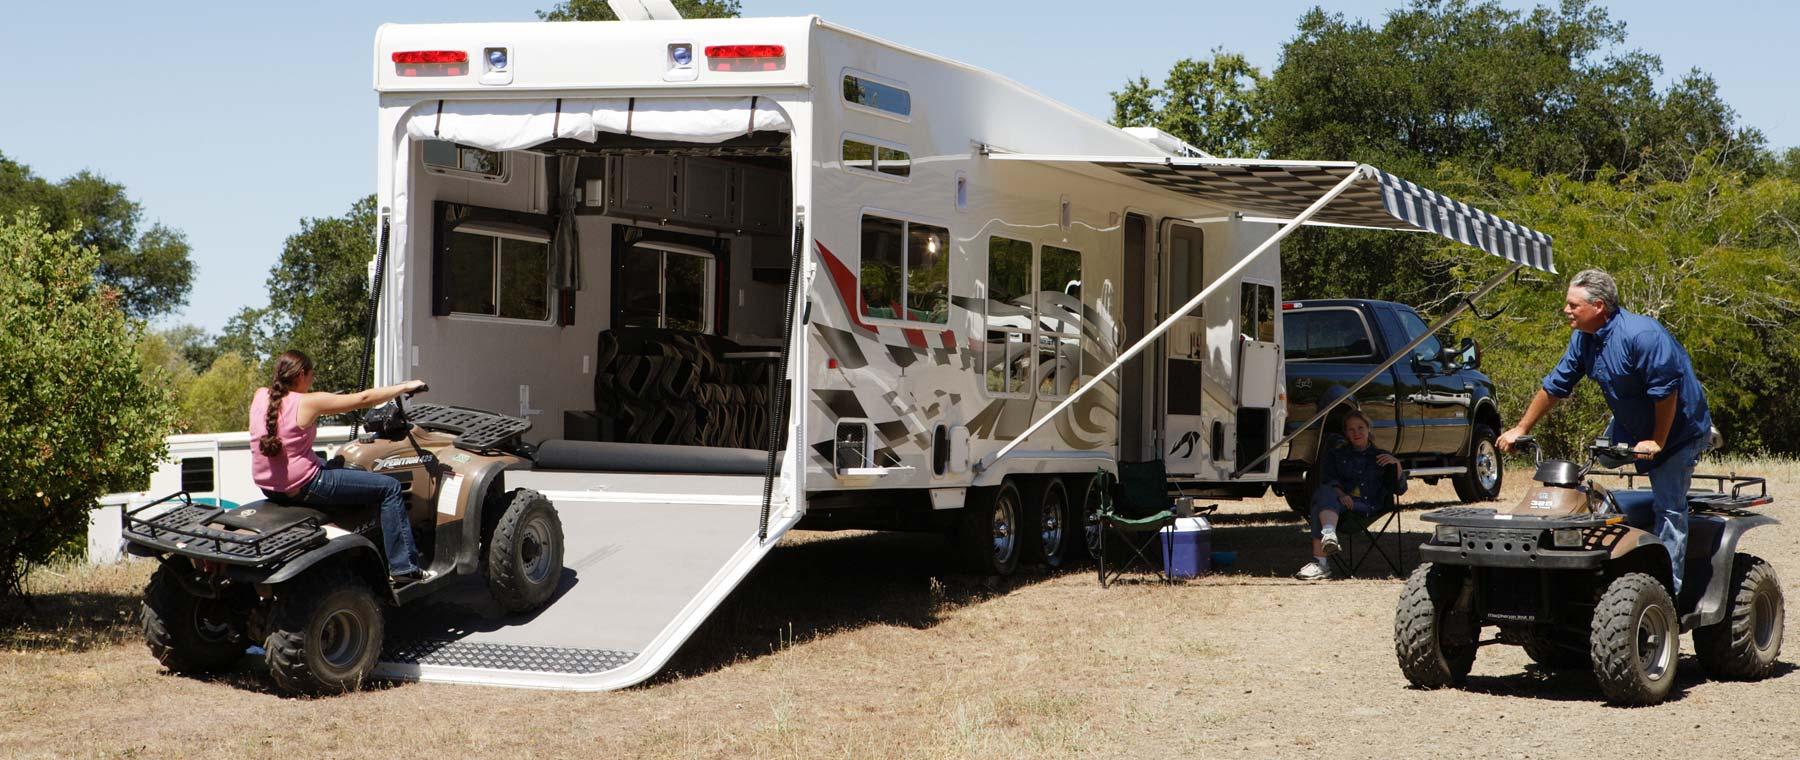 Toy Hauler RV Trailers - Go RVing Canada